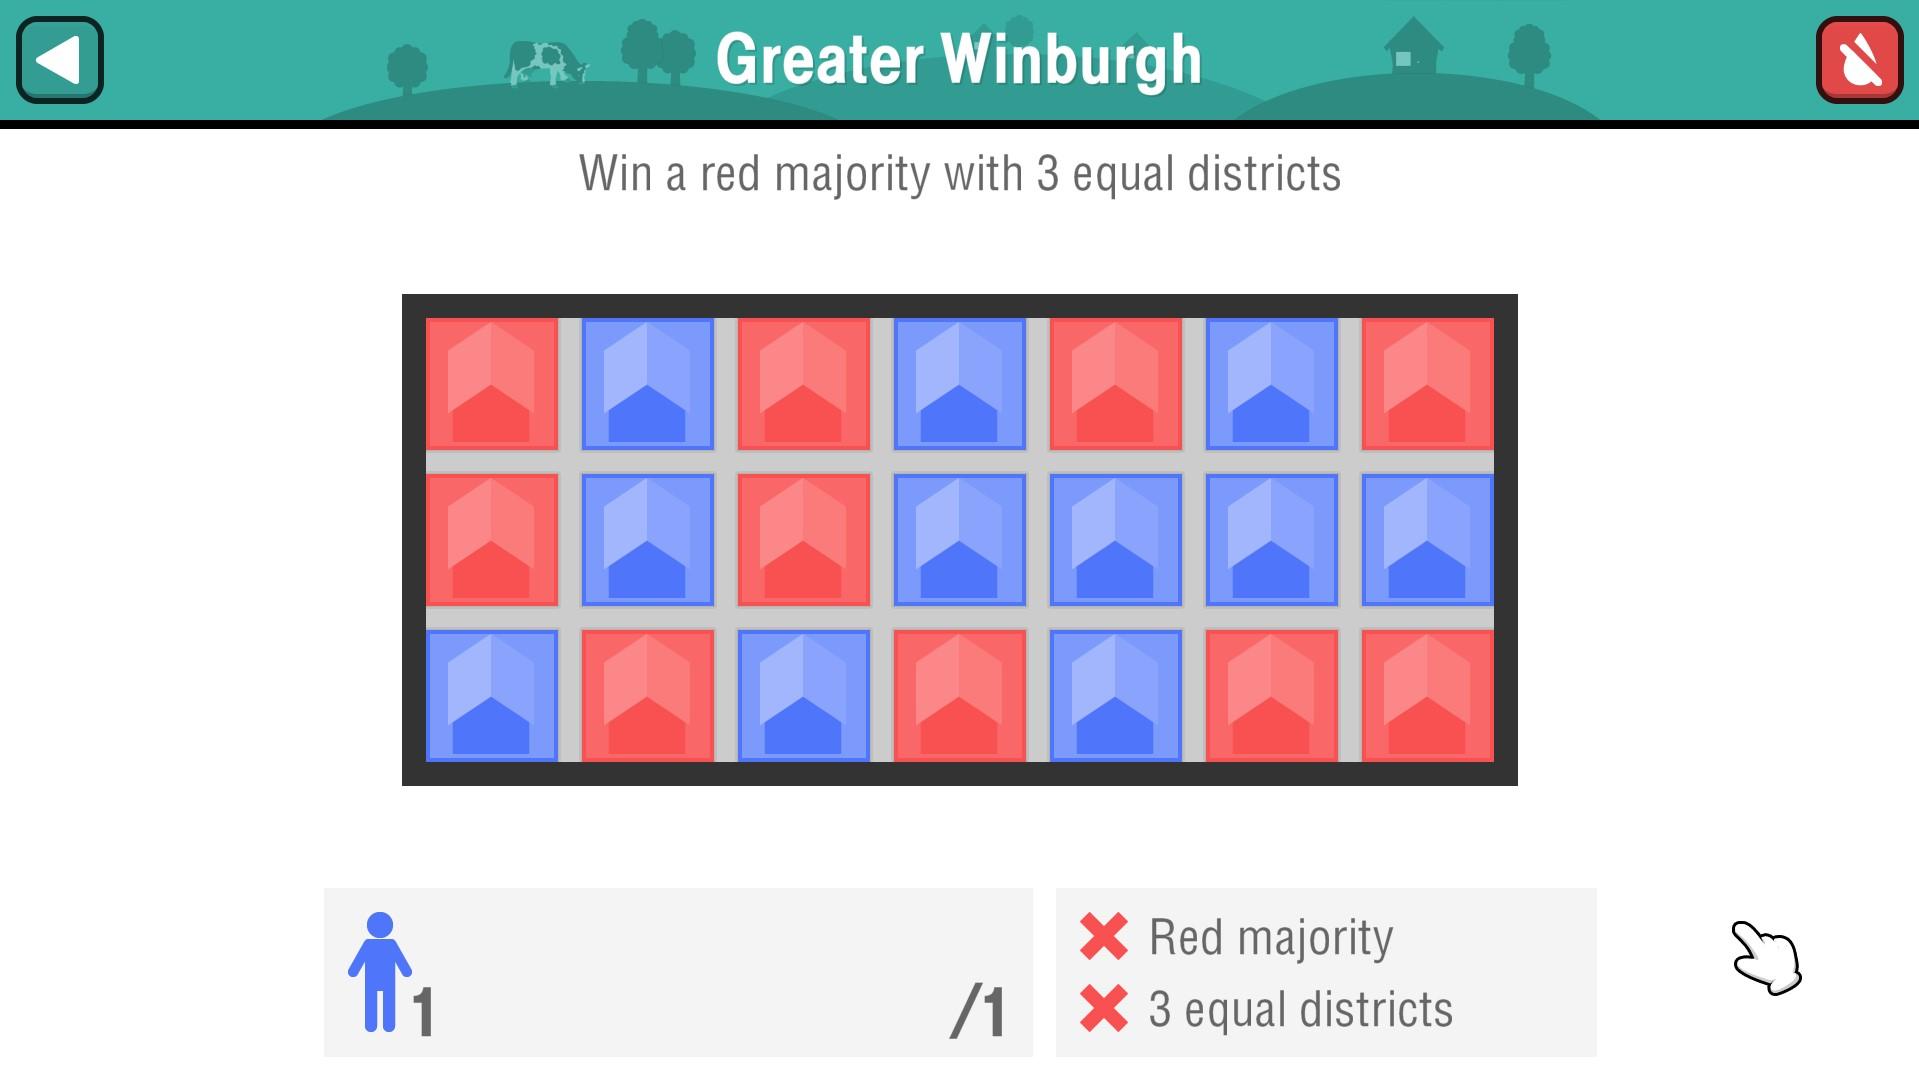 Greater Winburgh